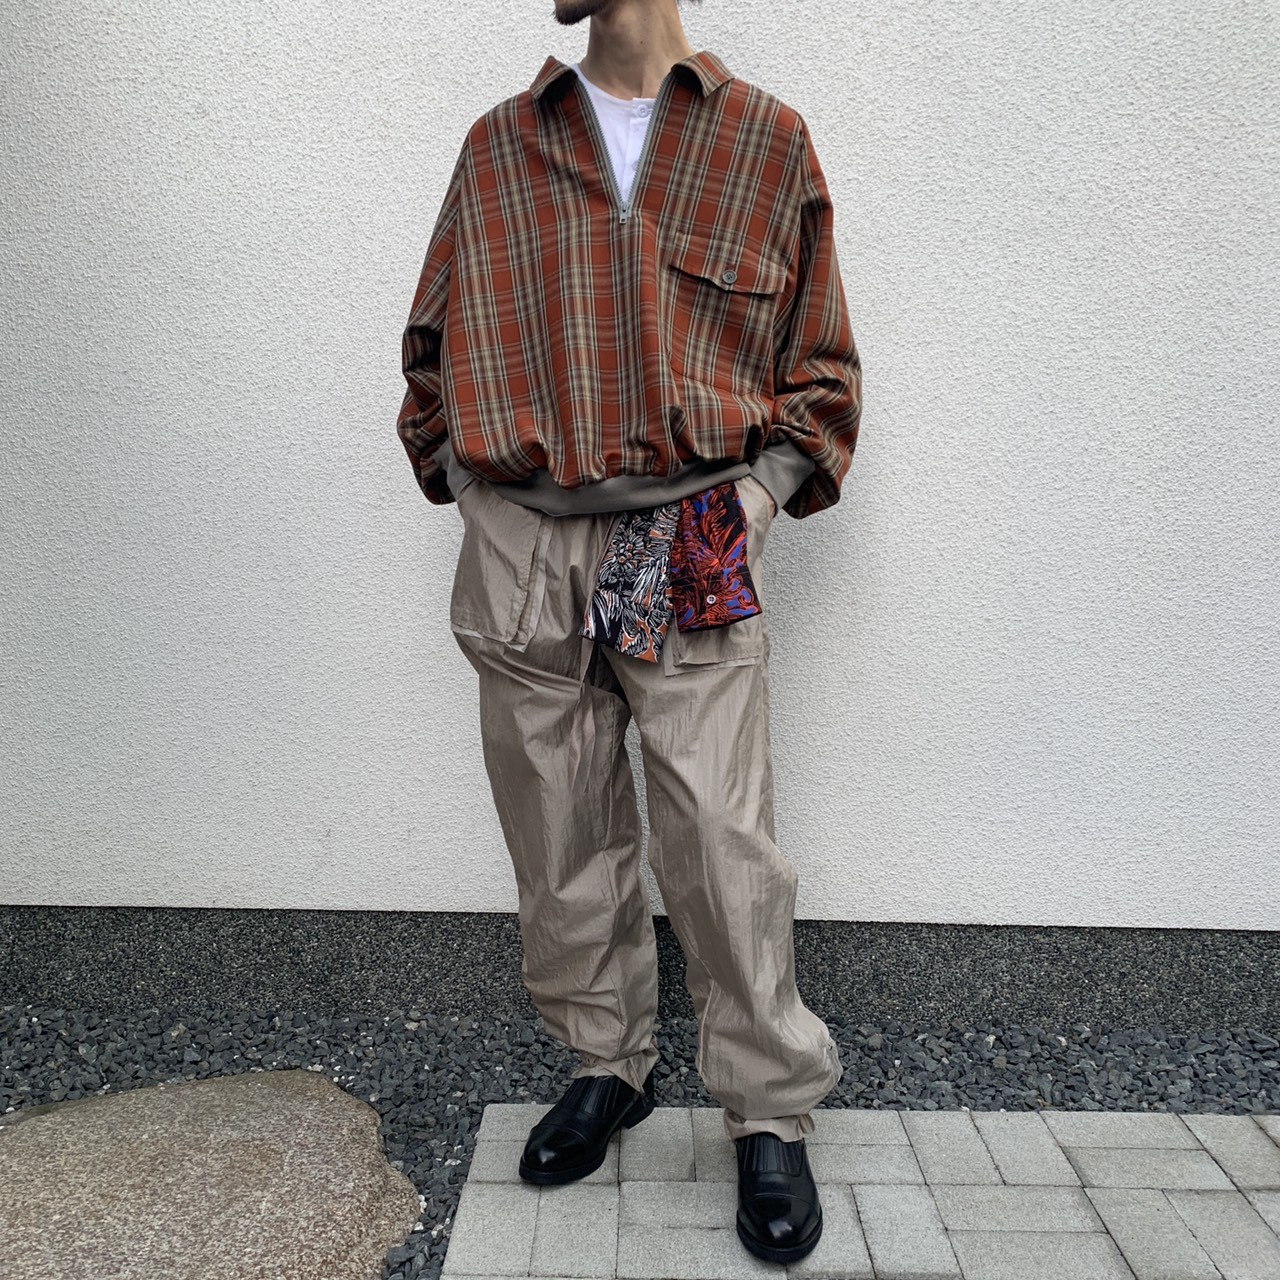 2019.04.08 styling sample......yasuda